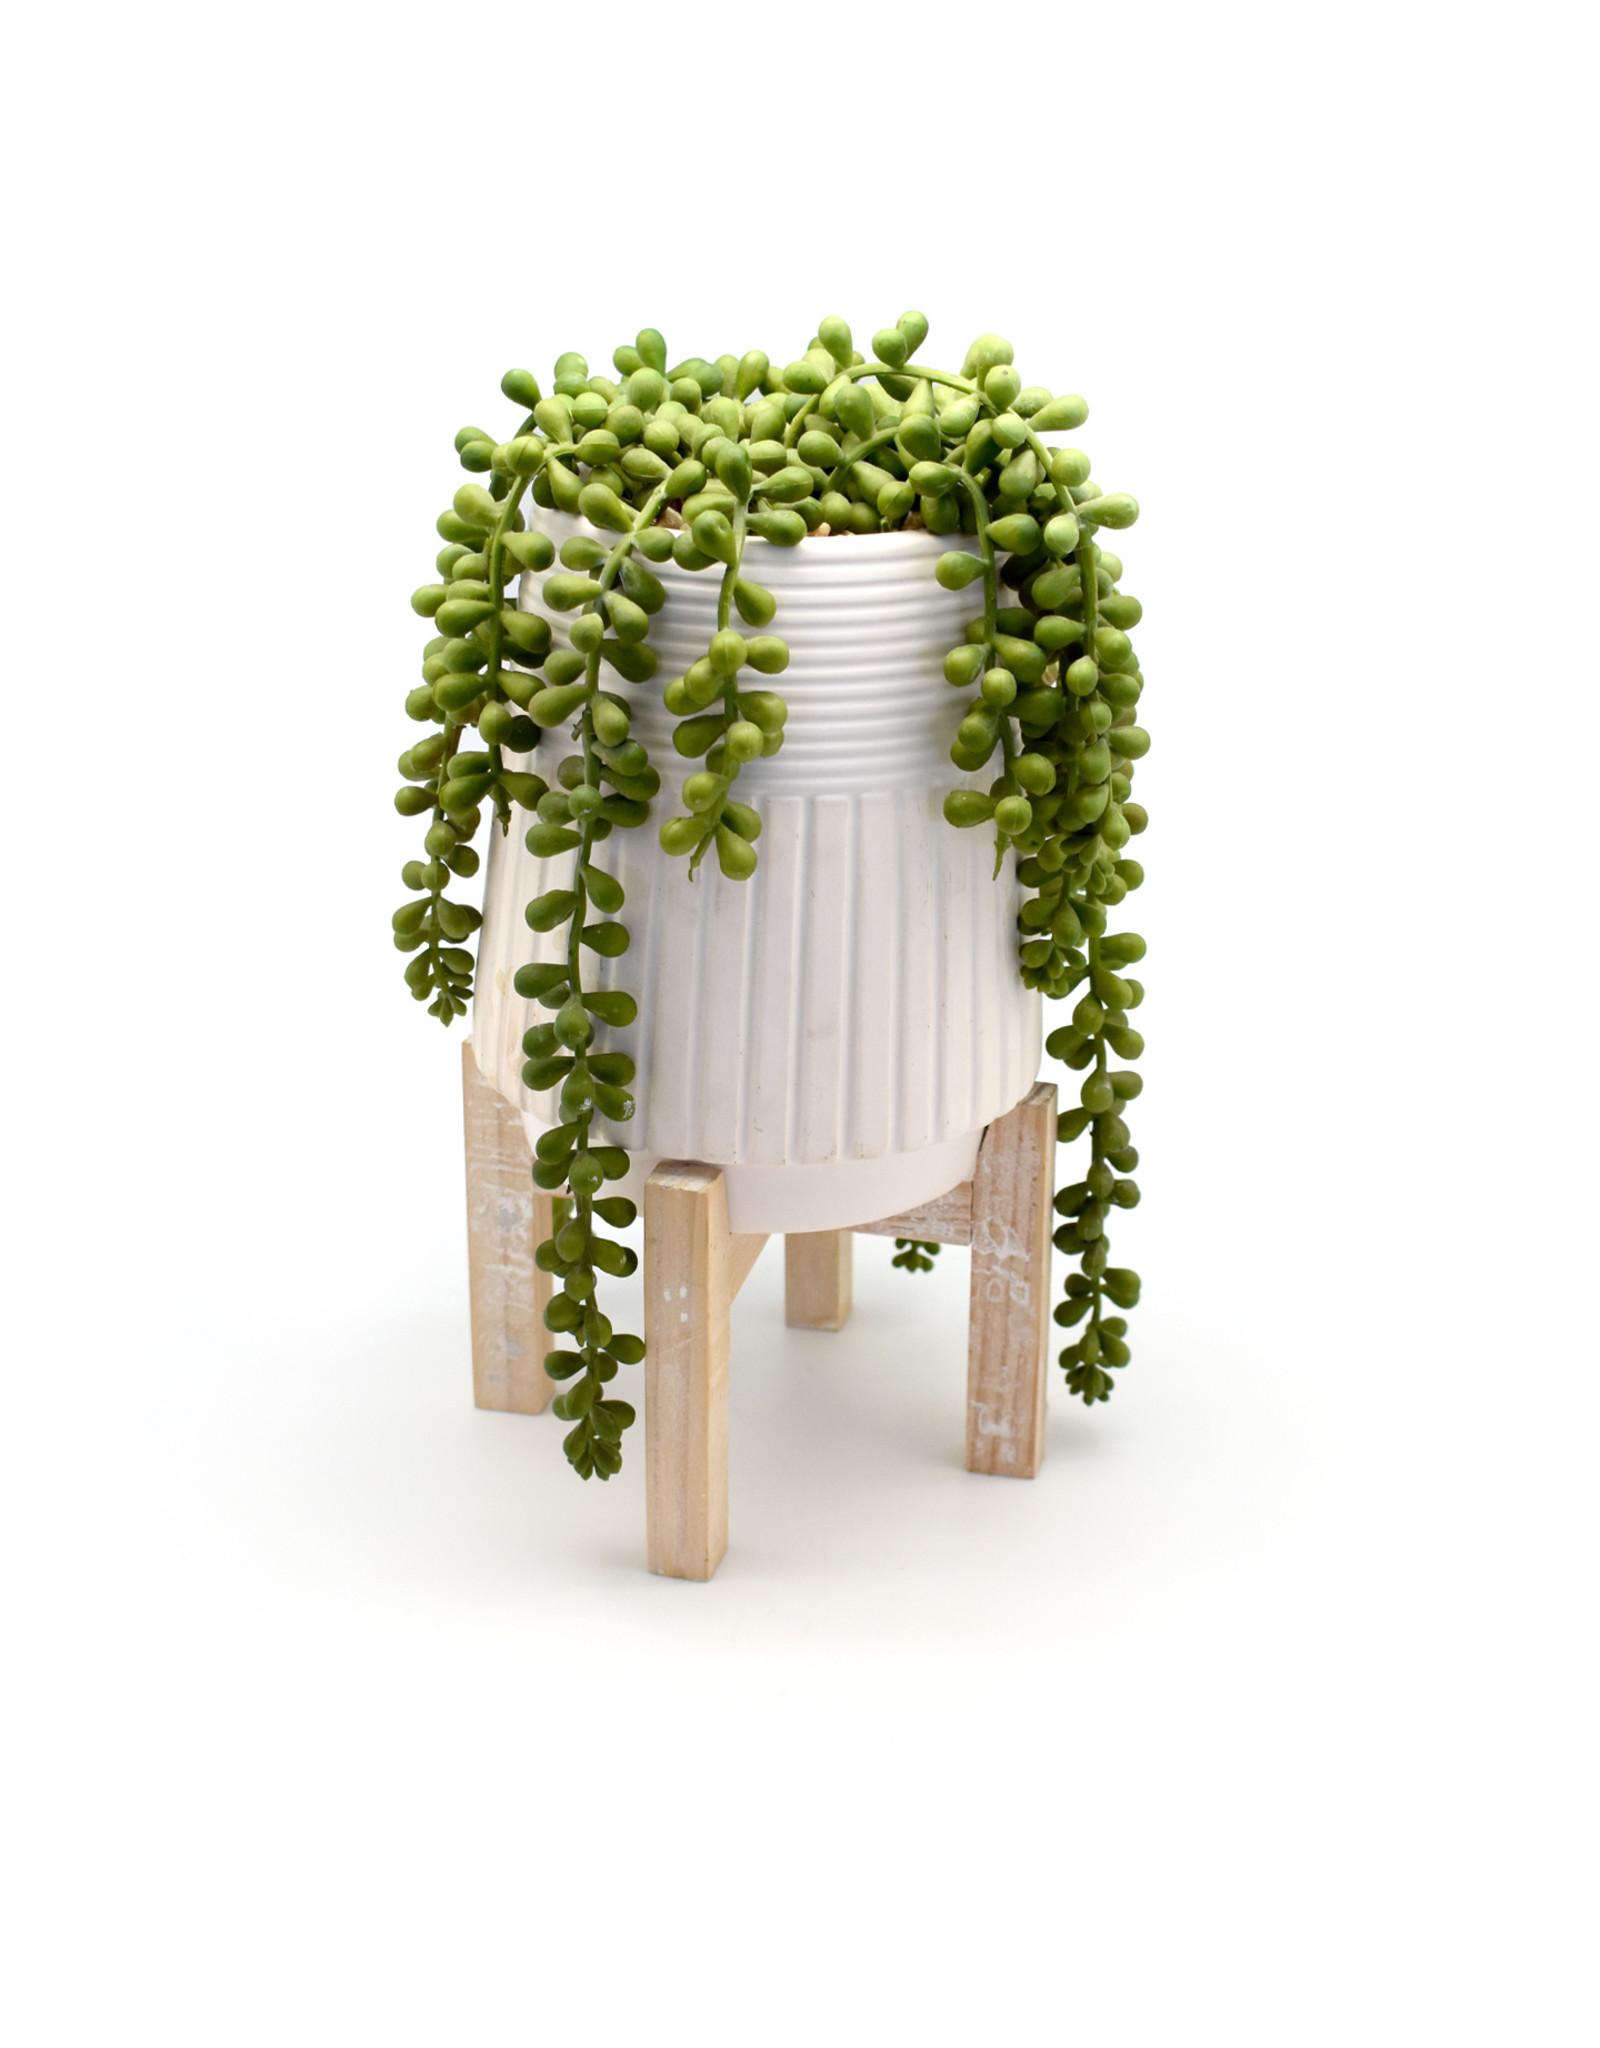 Donkey Tail in Ceramic Pot w/ Wood Stand